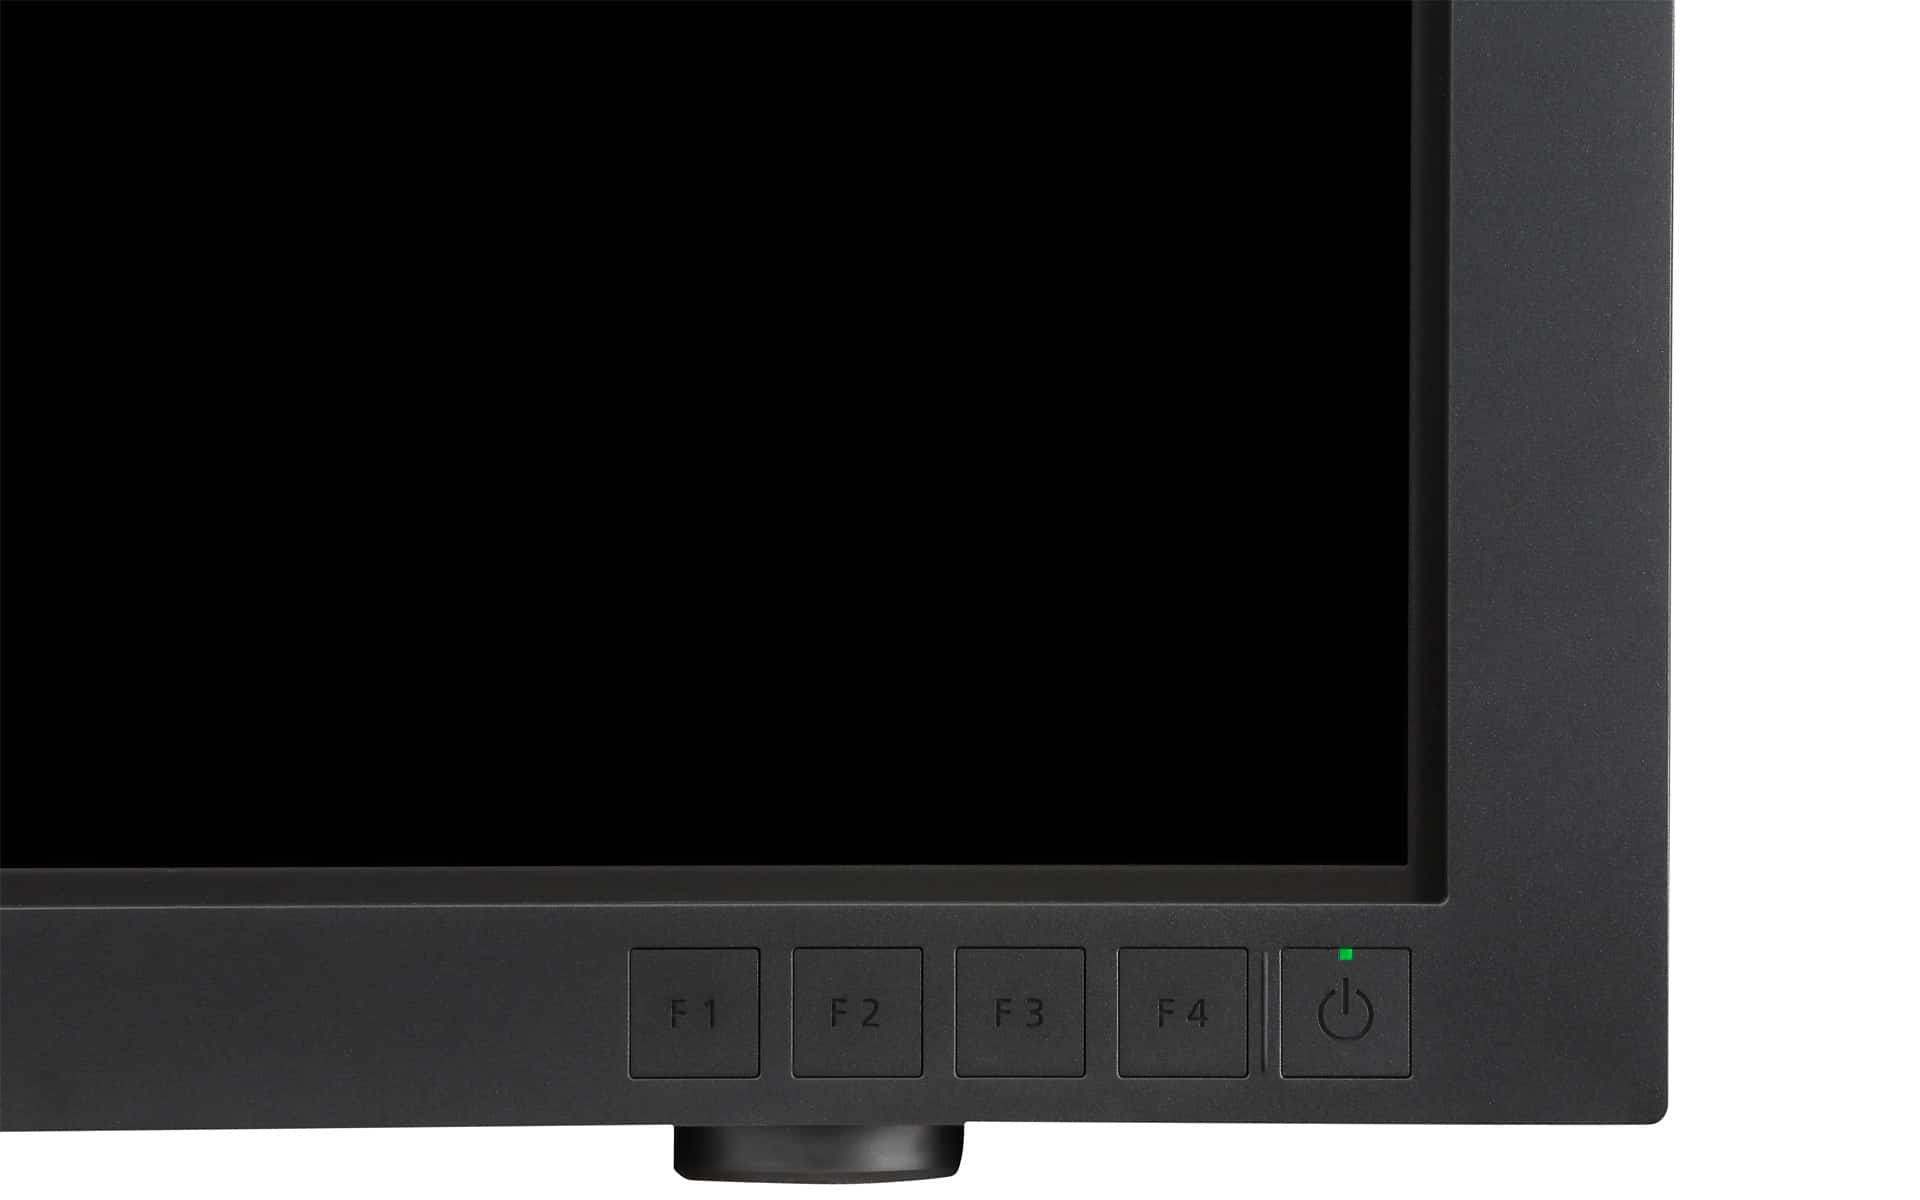 Bedienelemente am Canon DP-V3010 4K Monitor